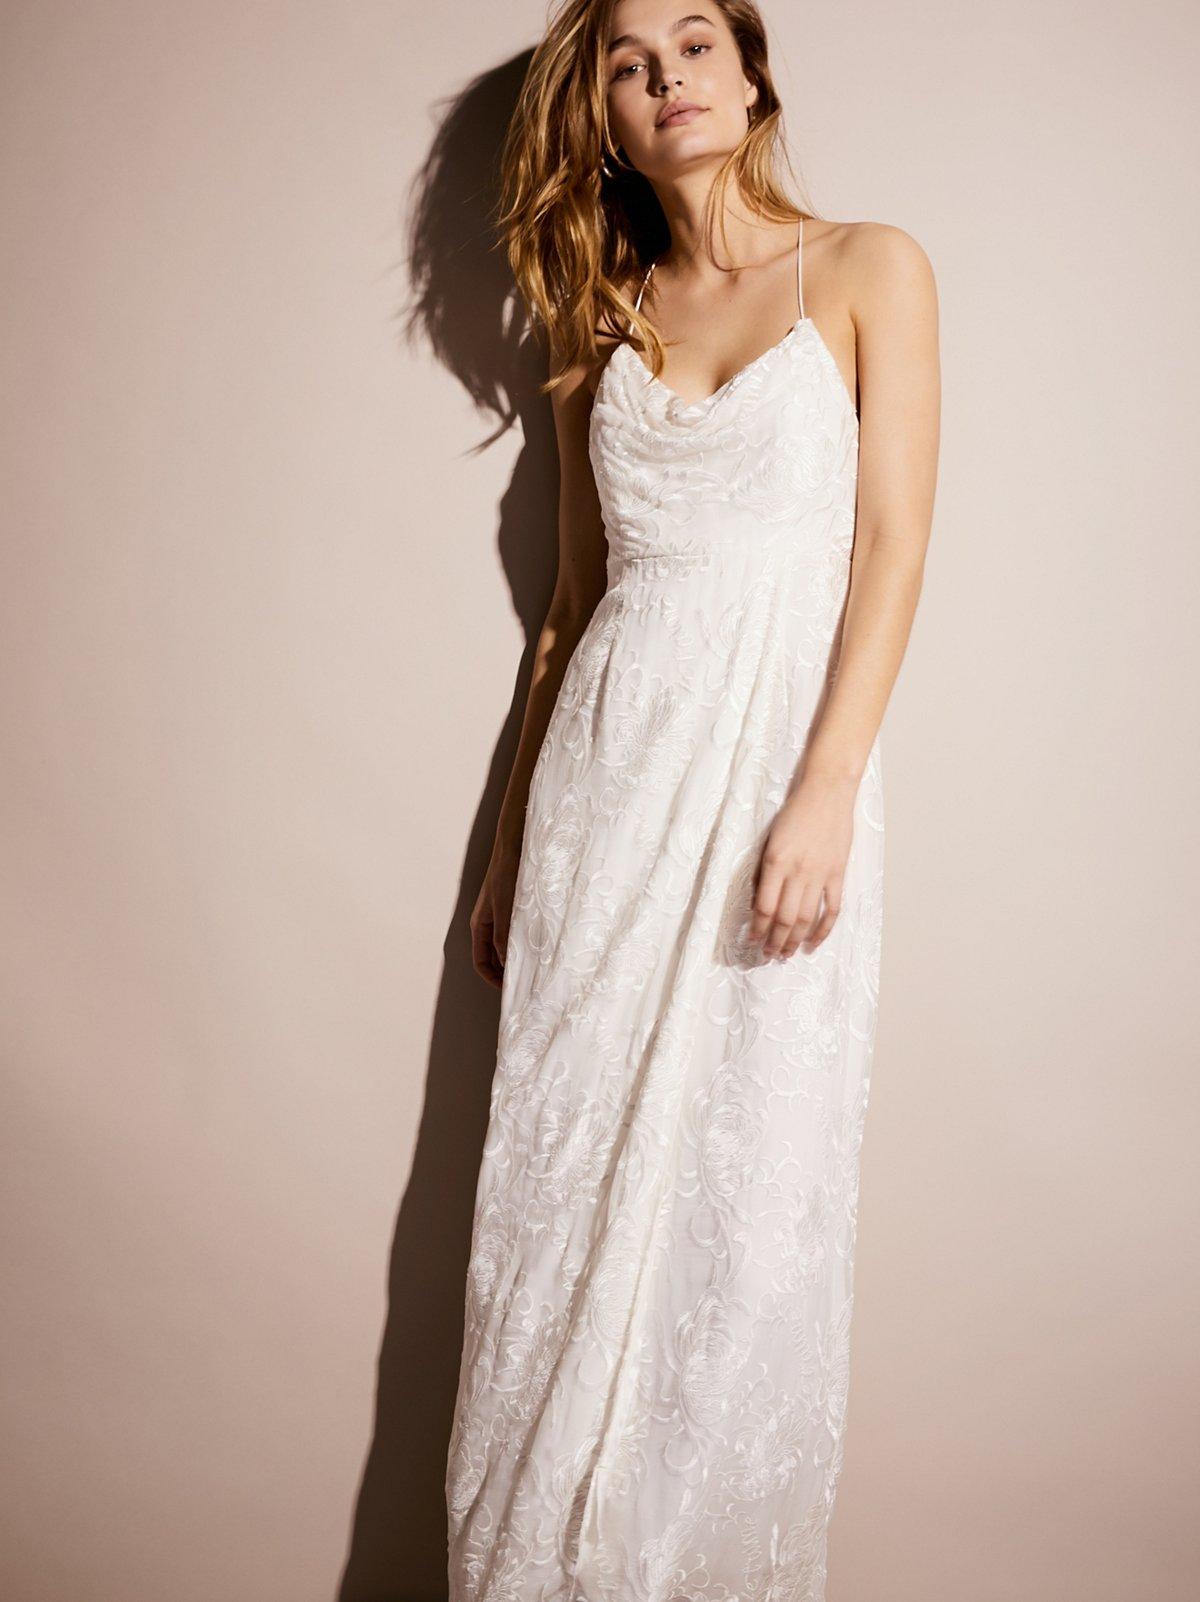 Jill's限量版白色连衣裙